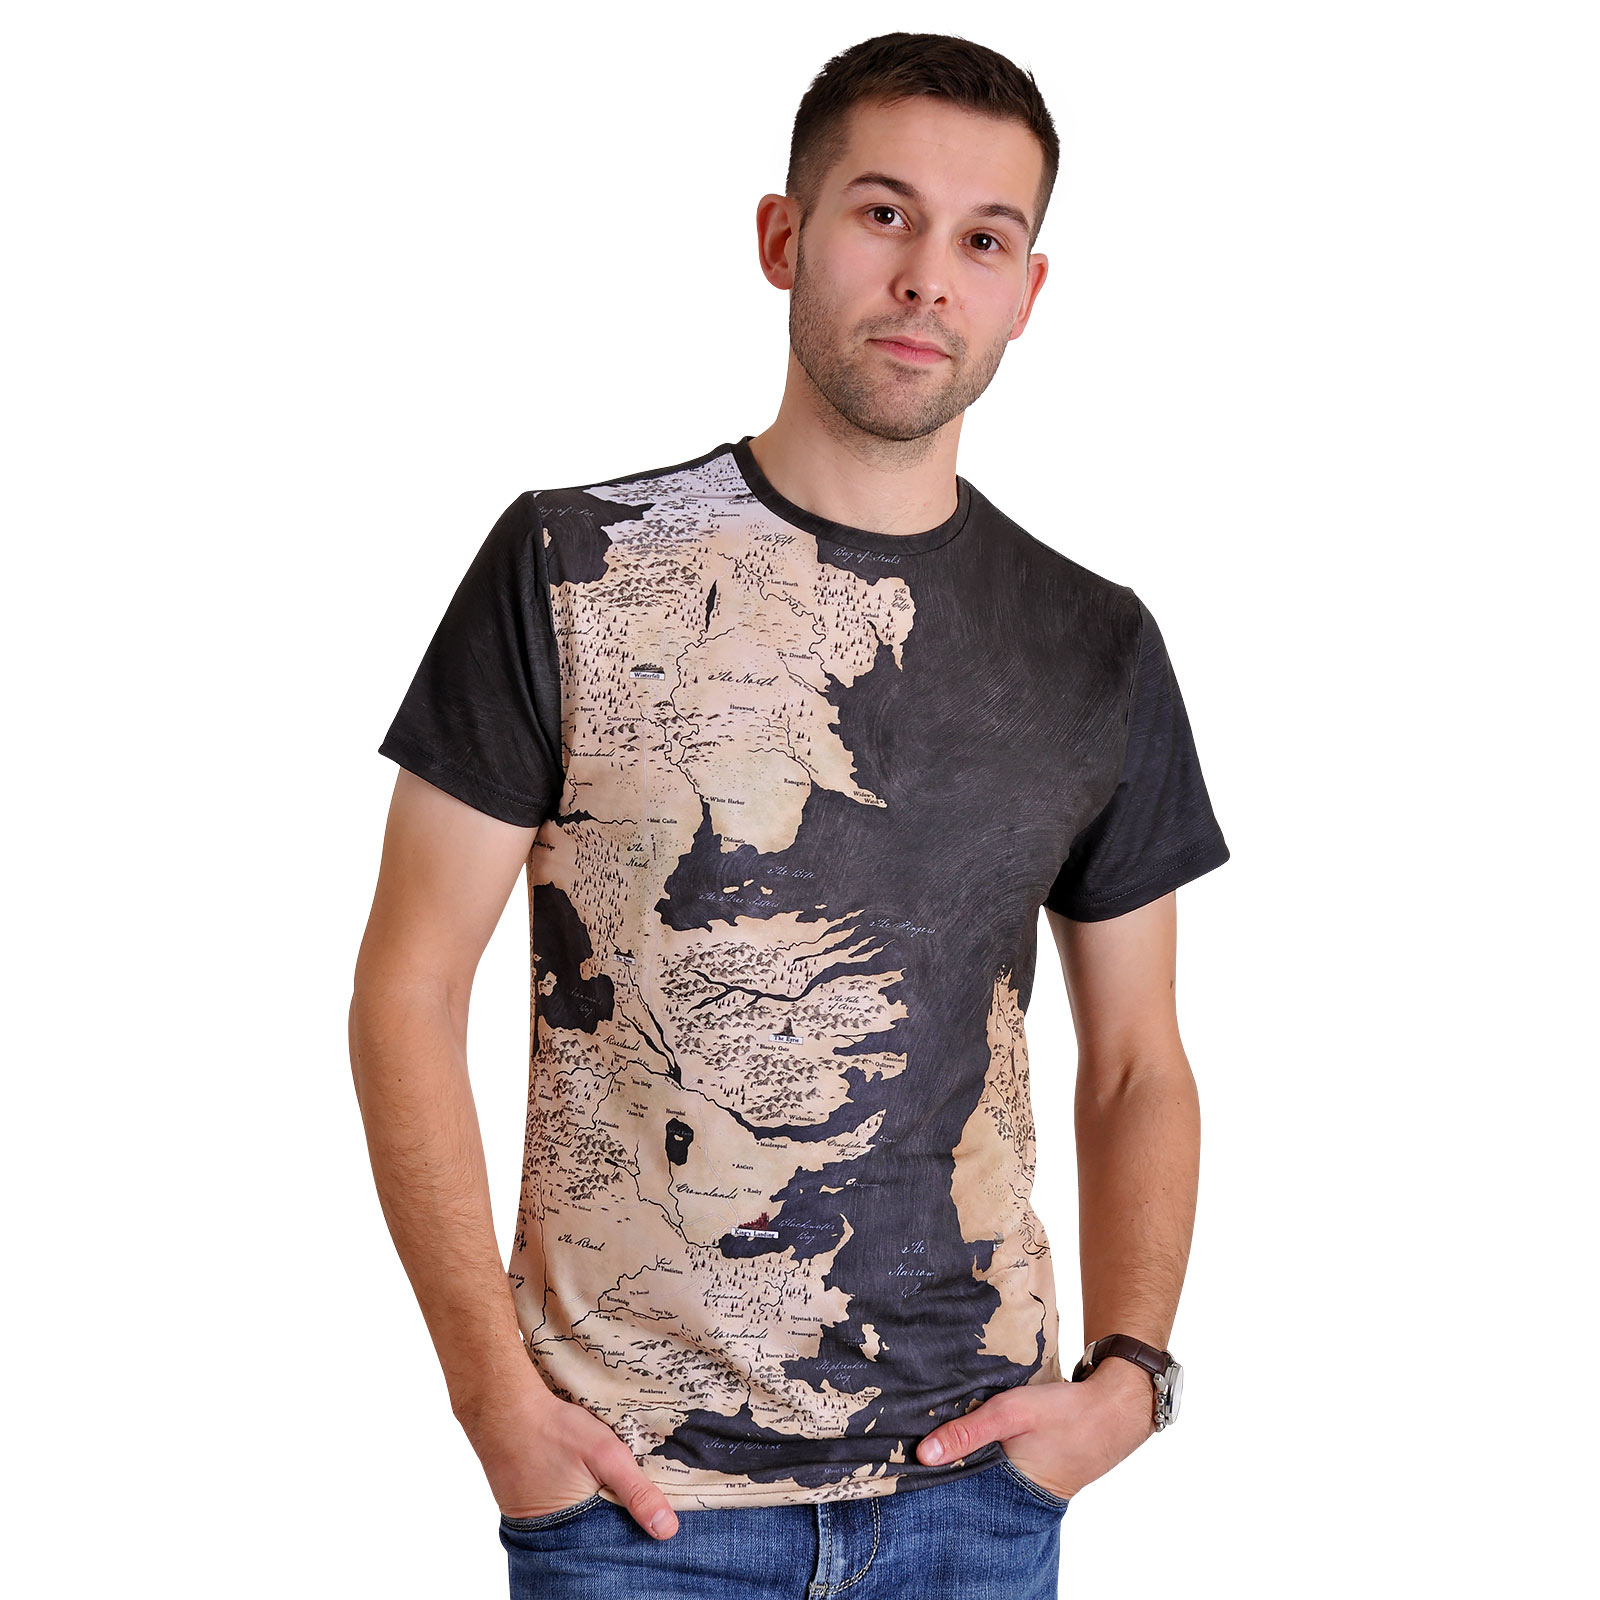 Game of Thrones - Westeros und Essos T-Shirt